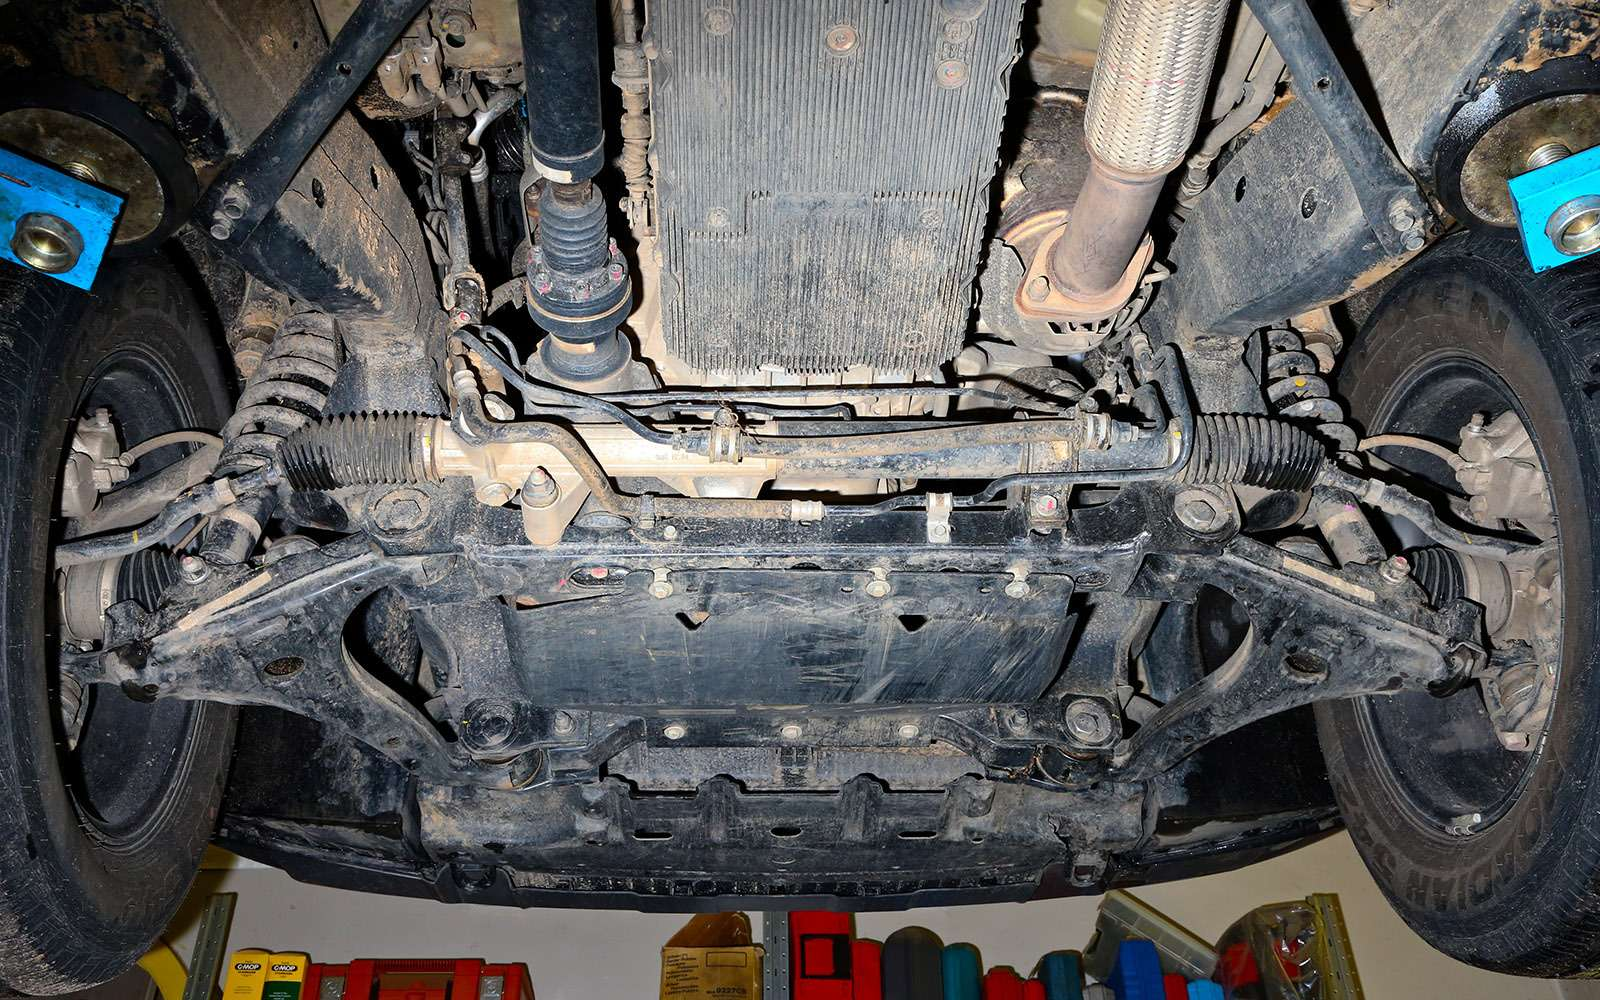 Mitsubishi Pajero Sport иKia Mohave— сравнительный тест настоящих внедорожников— фото 769867